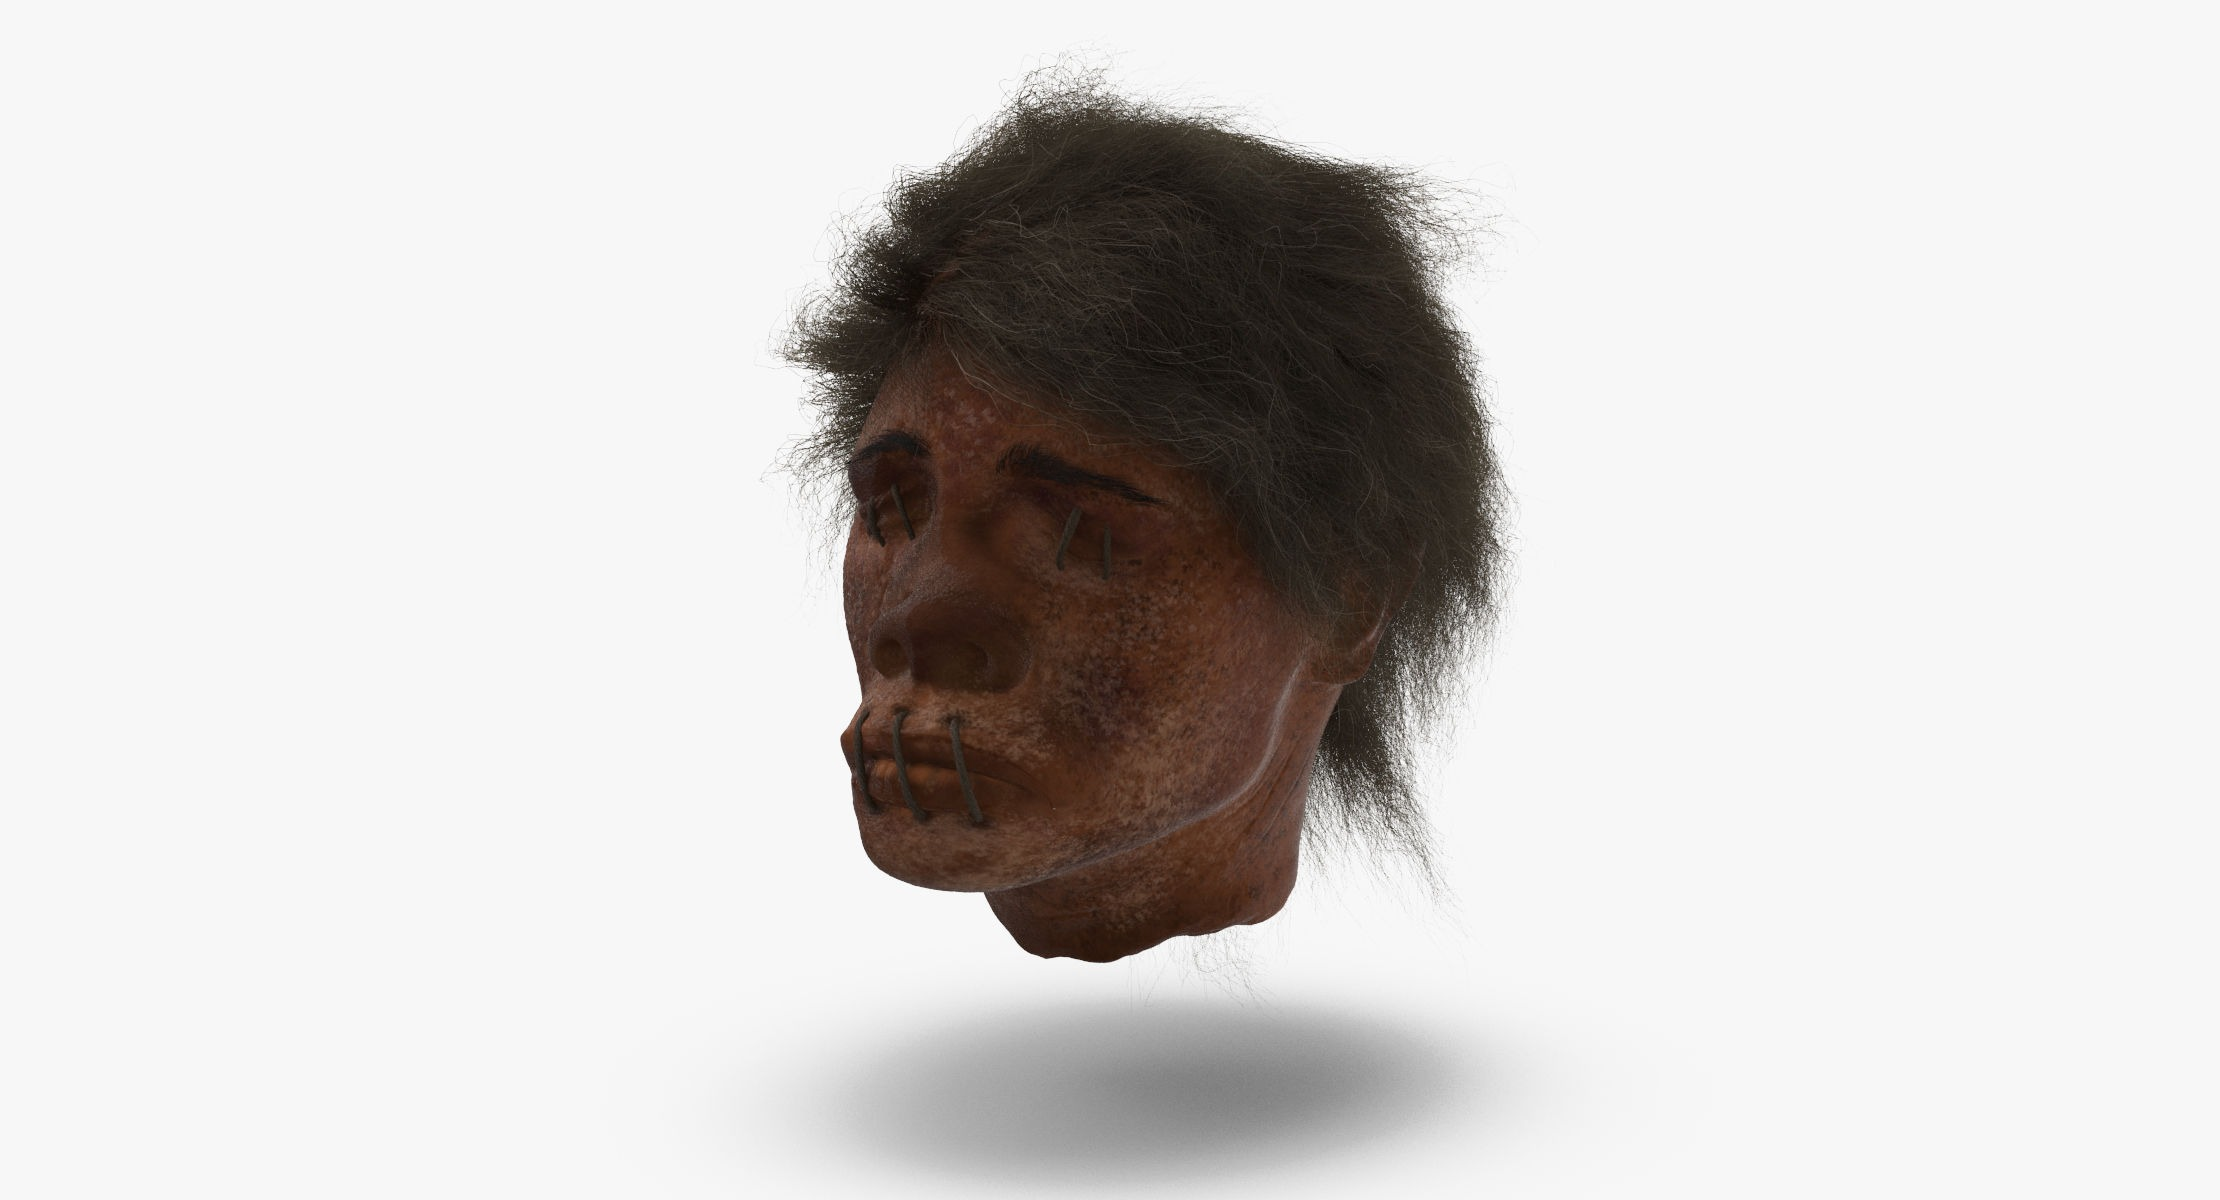 Shrunken Head 01 - reel 1